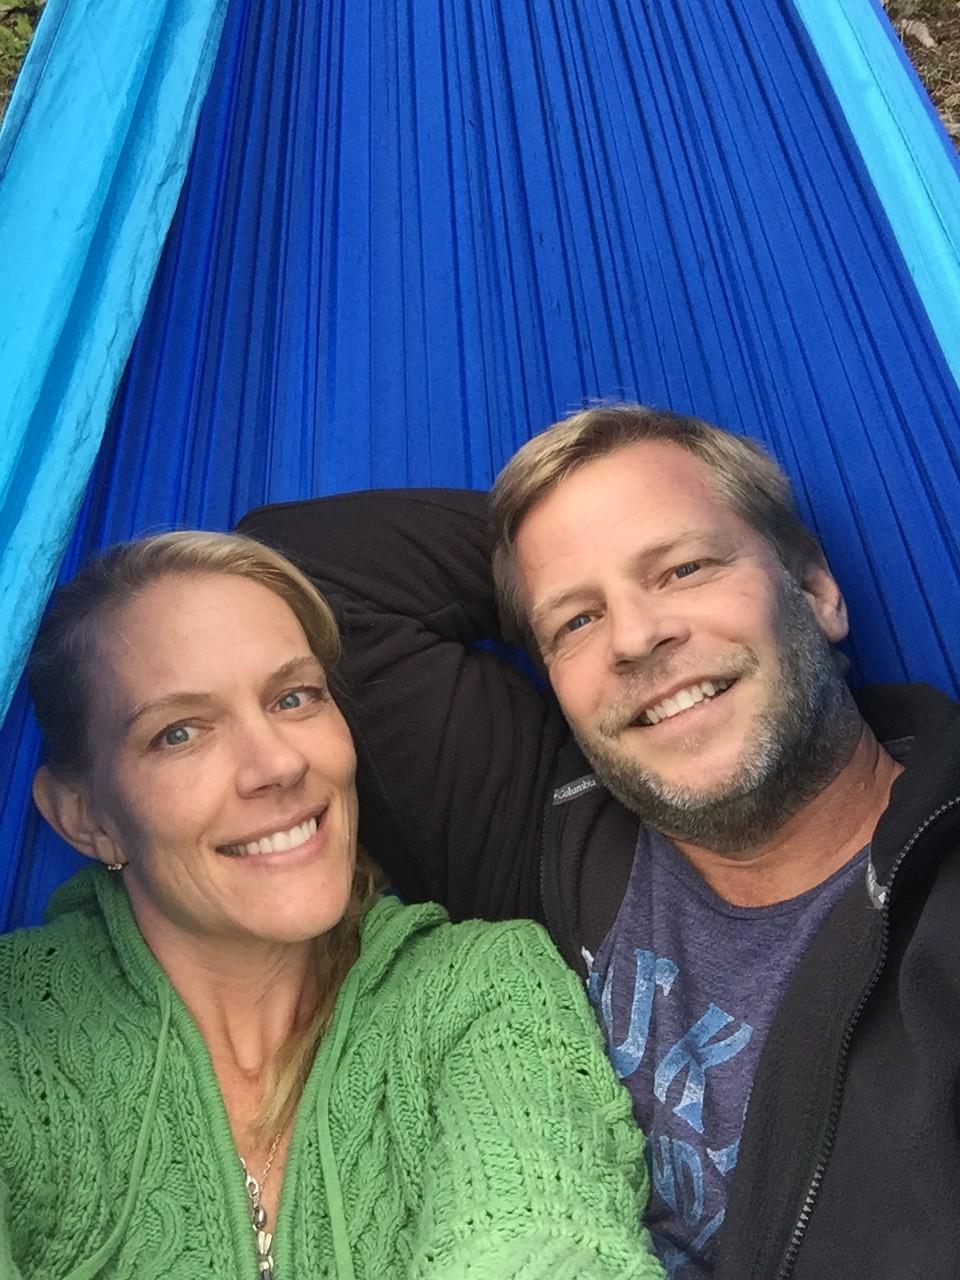 Day 4 - hammock